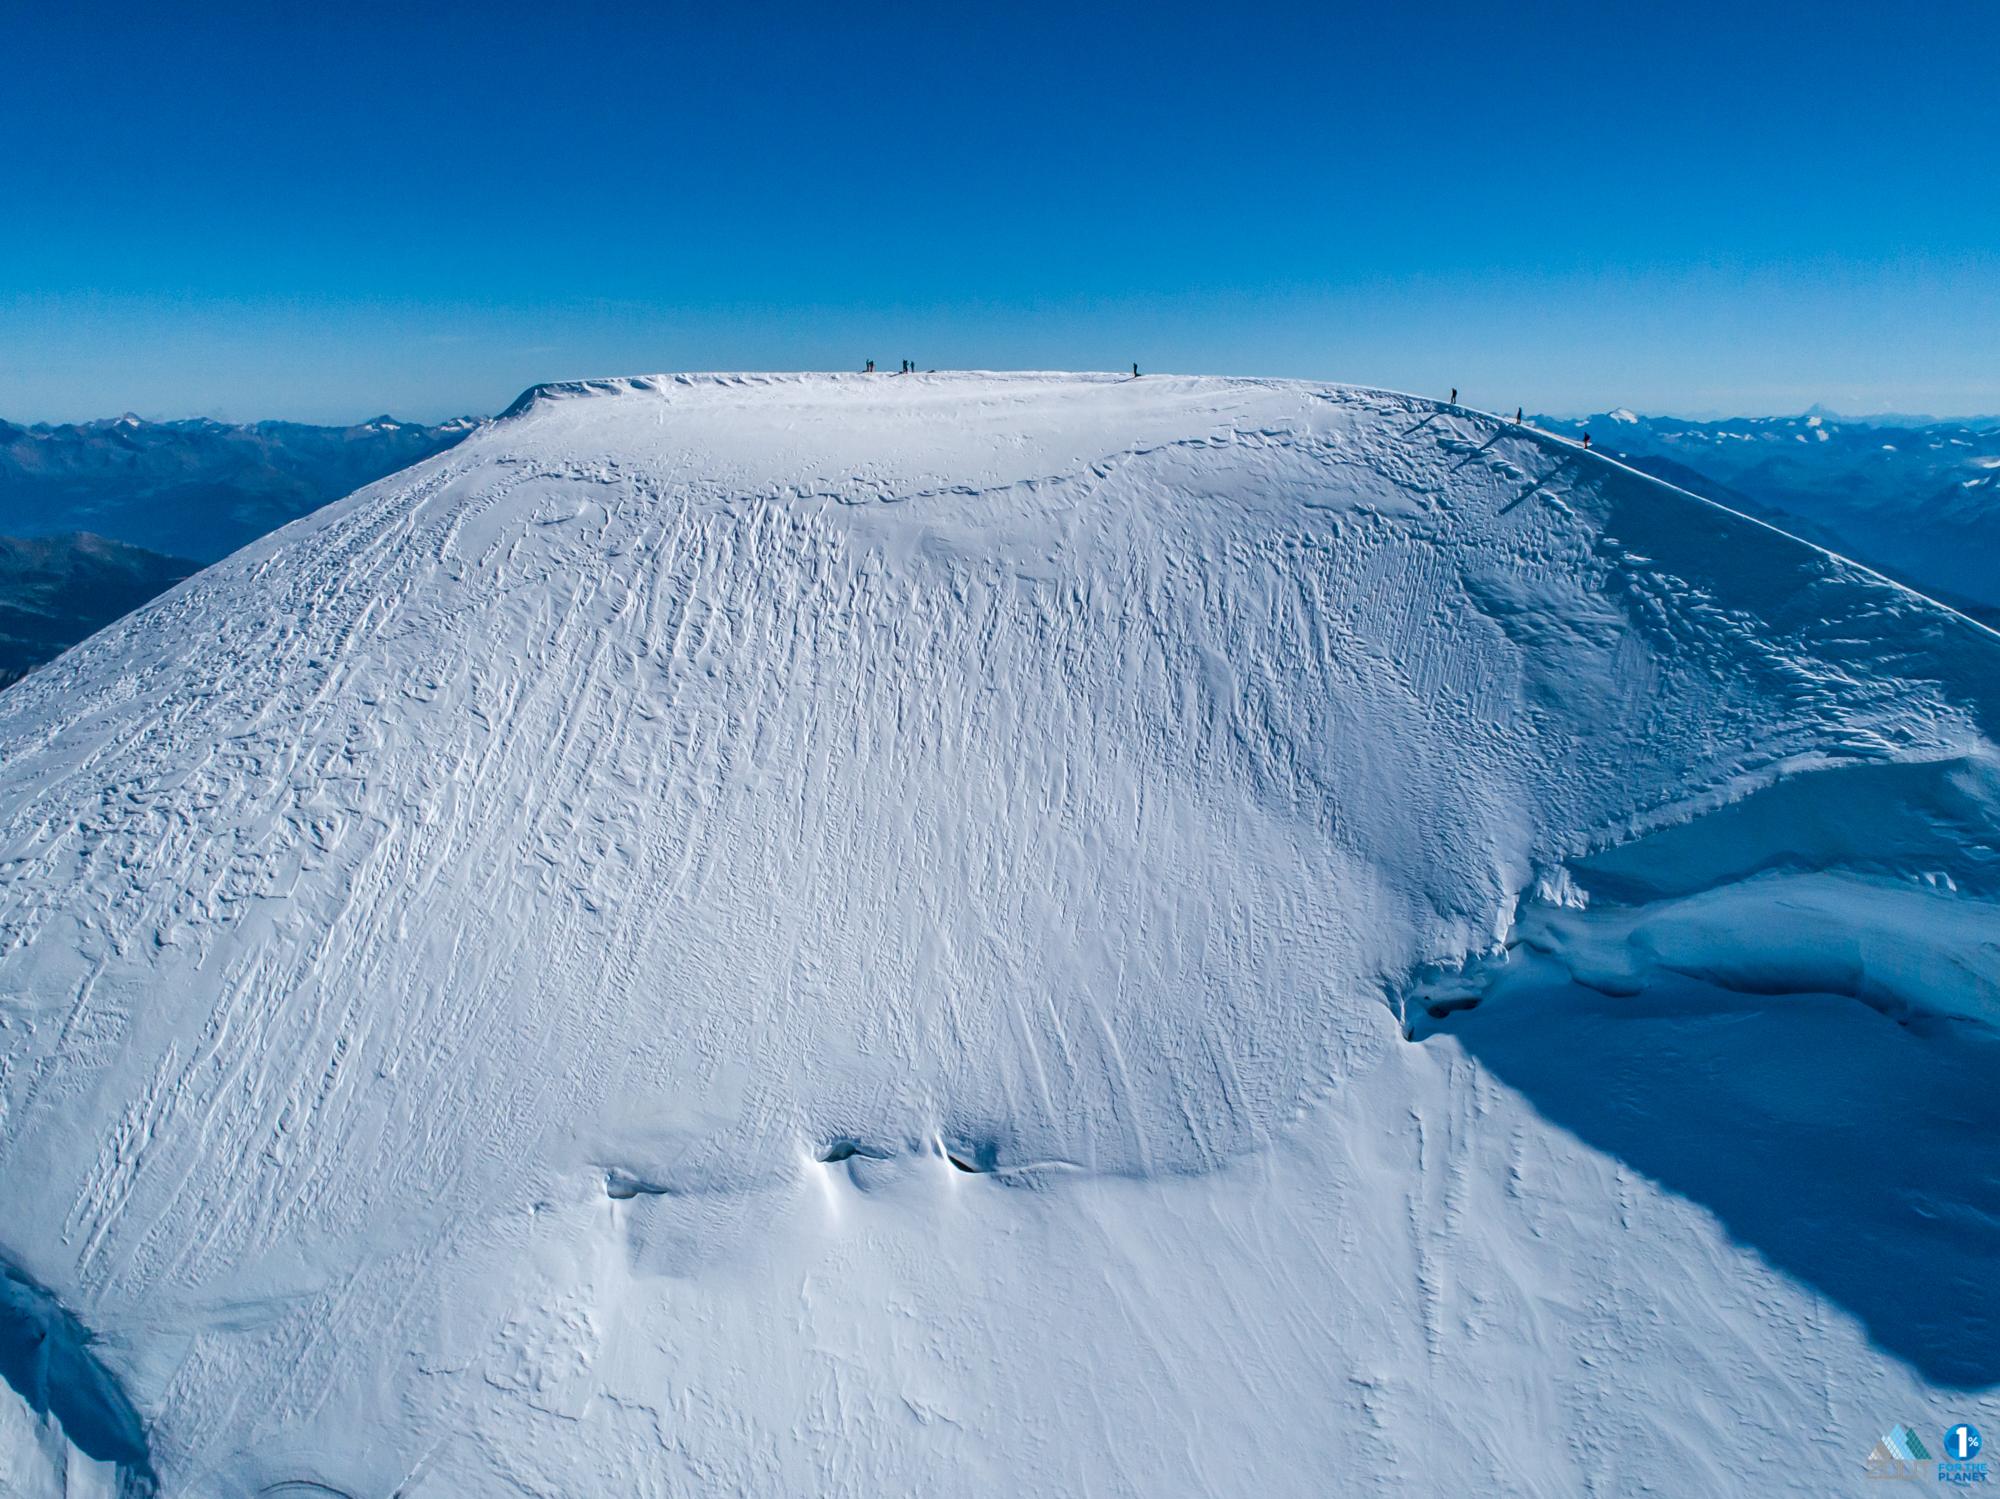 Summit Mt Blanc